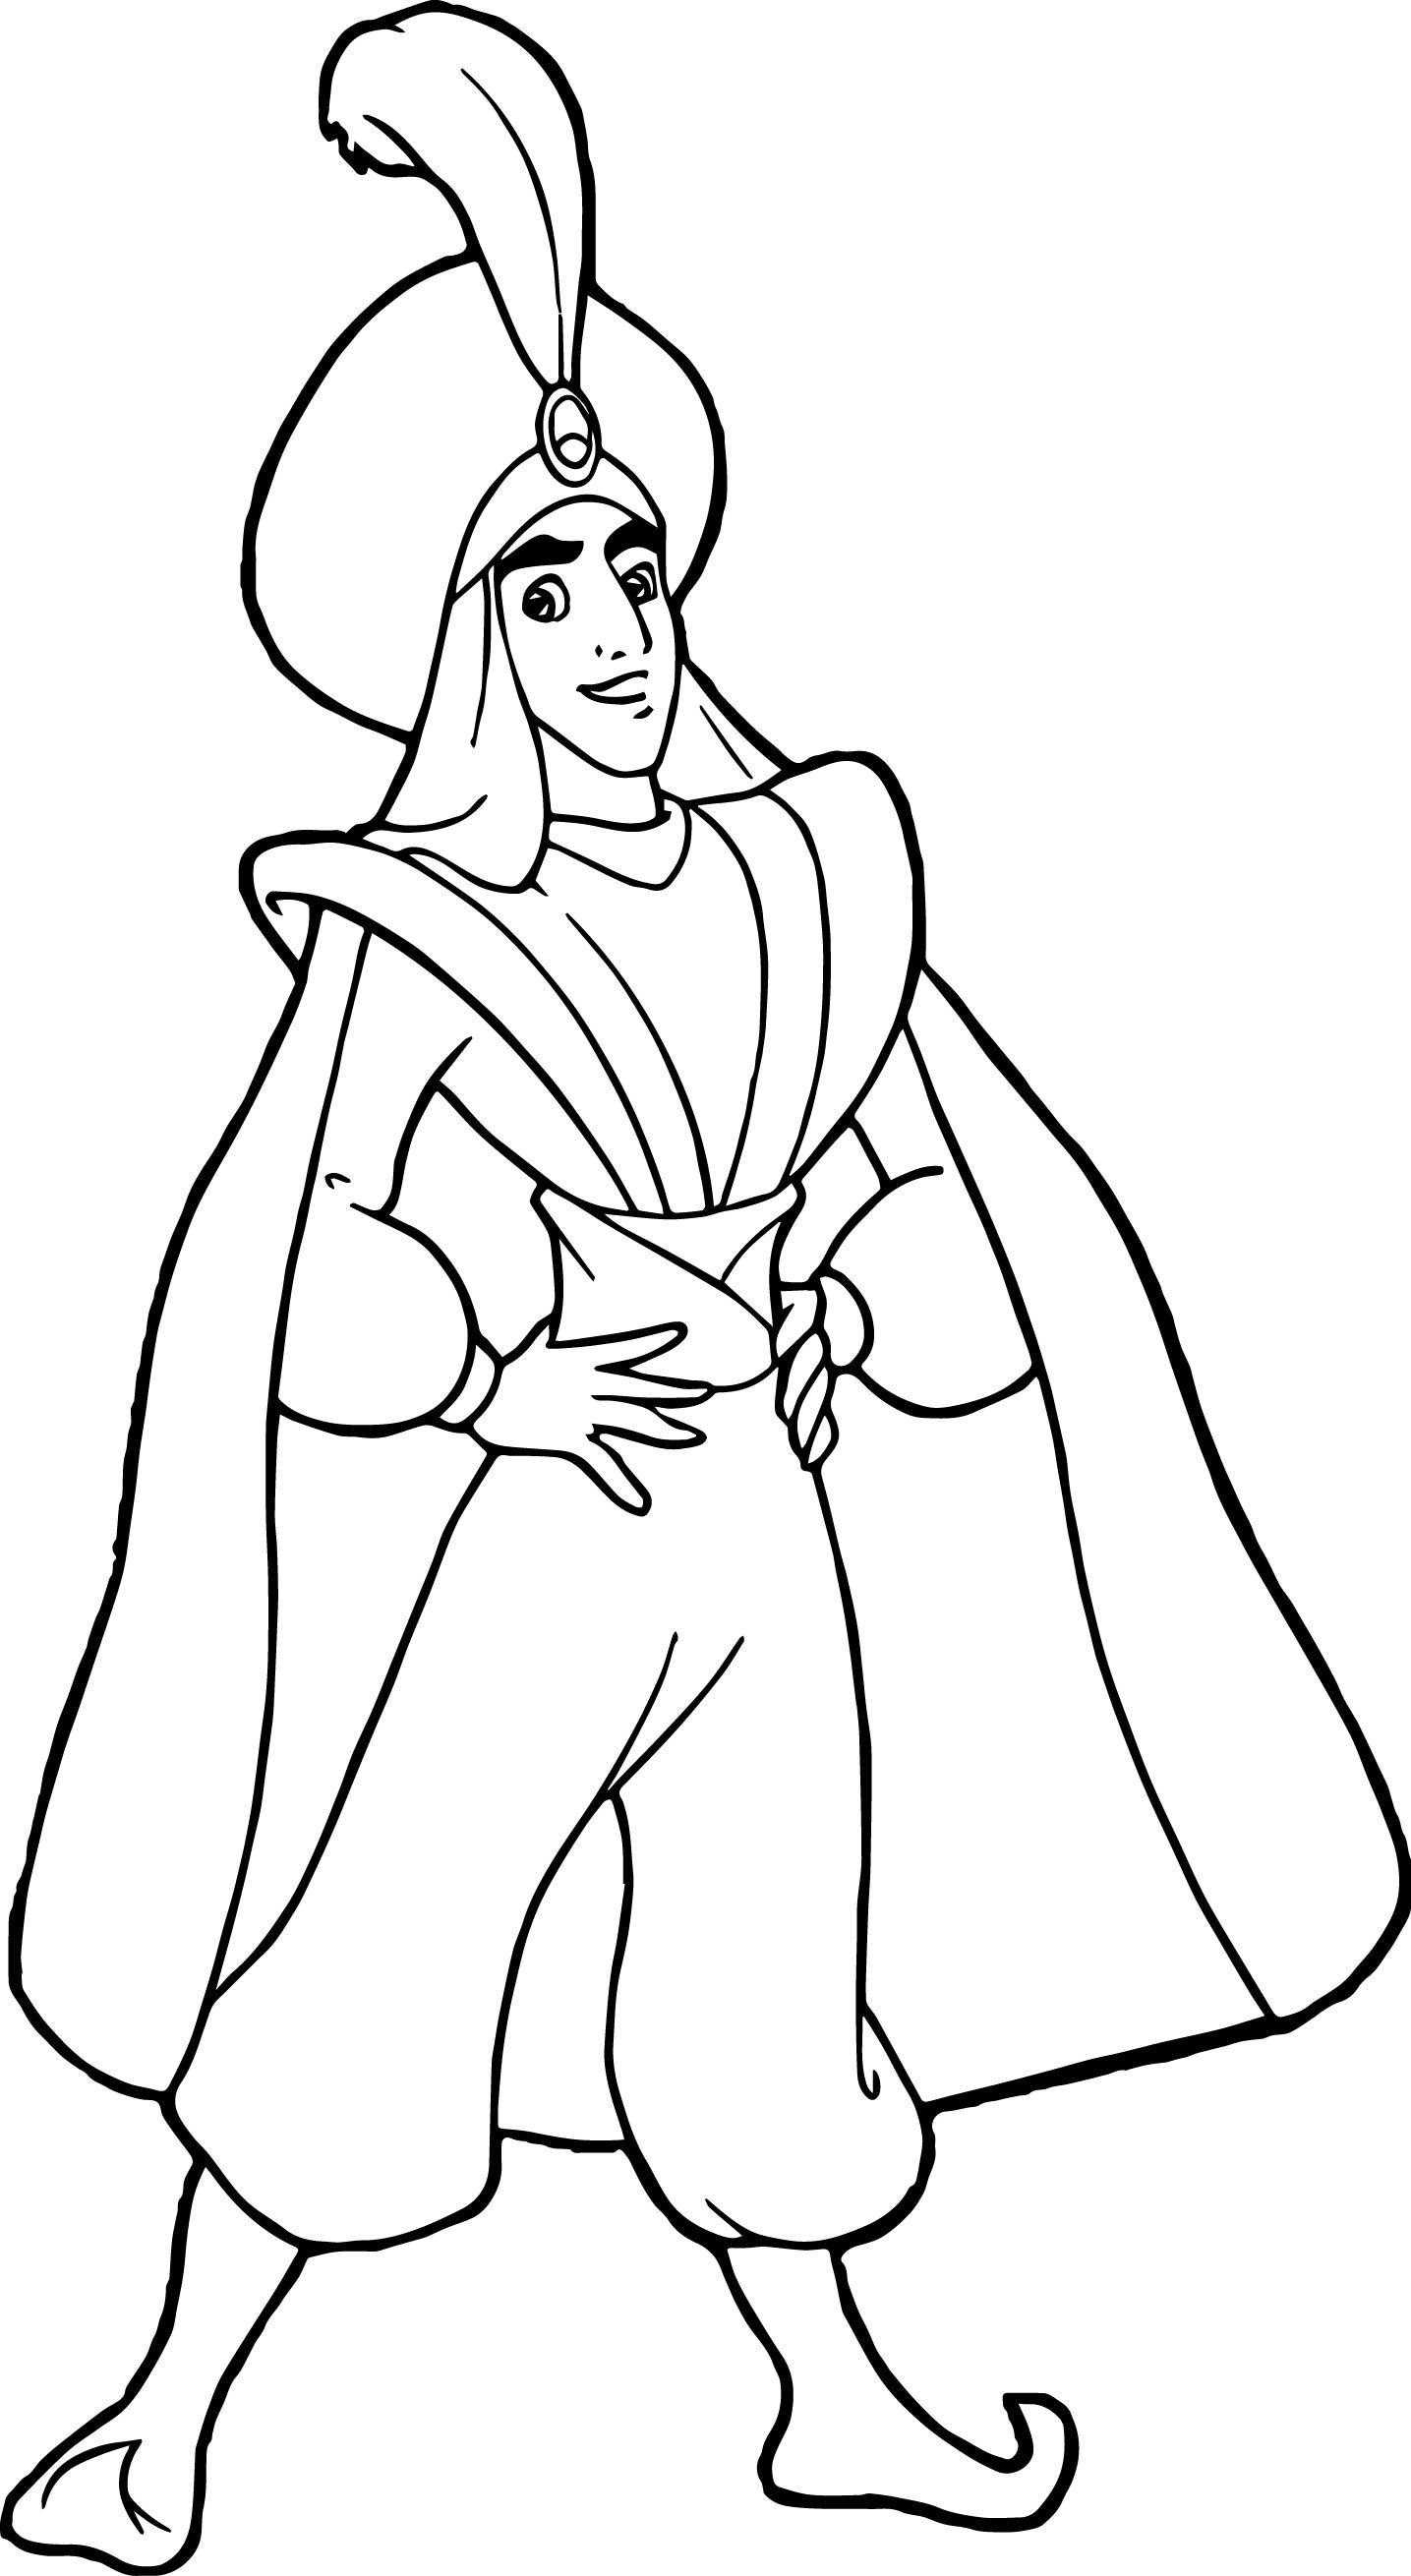 Cool Prince Ali Aladdin Coloring Page